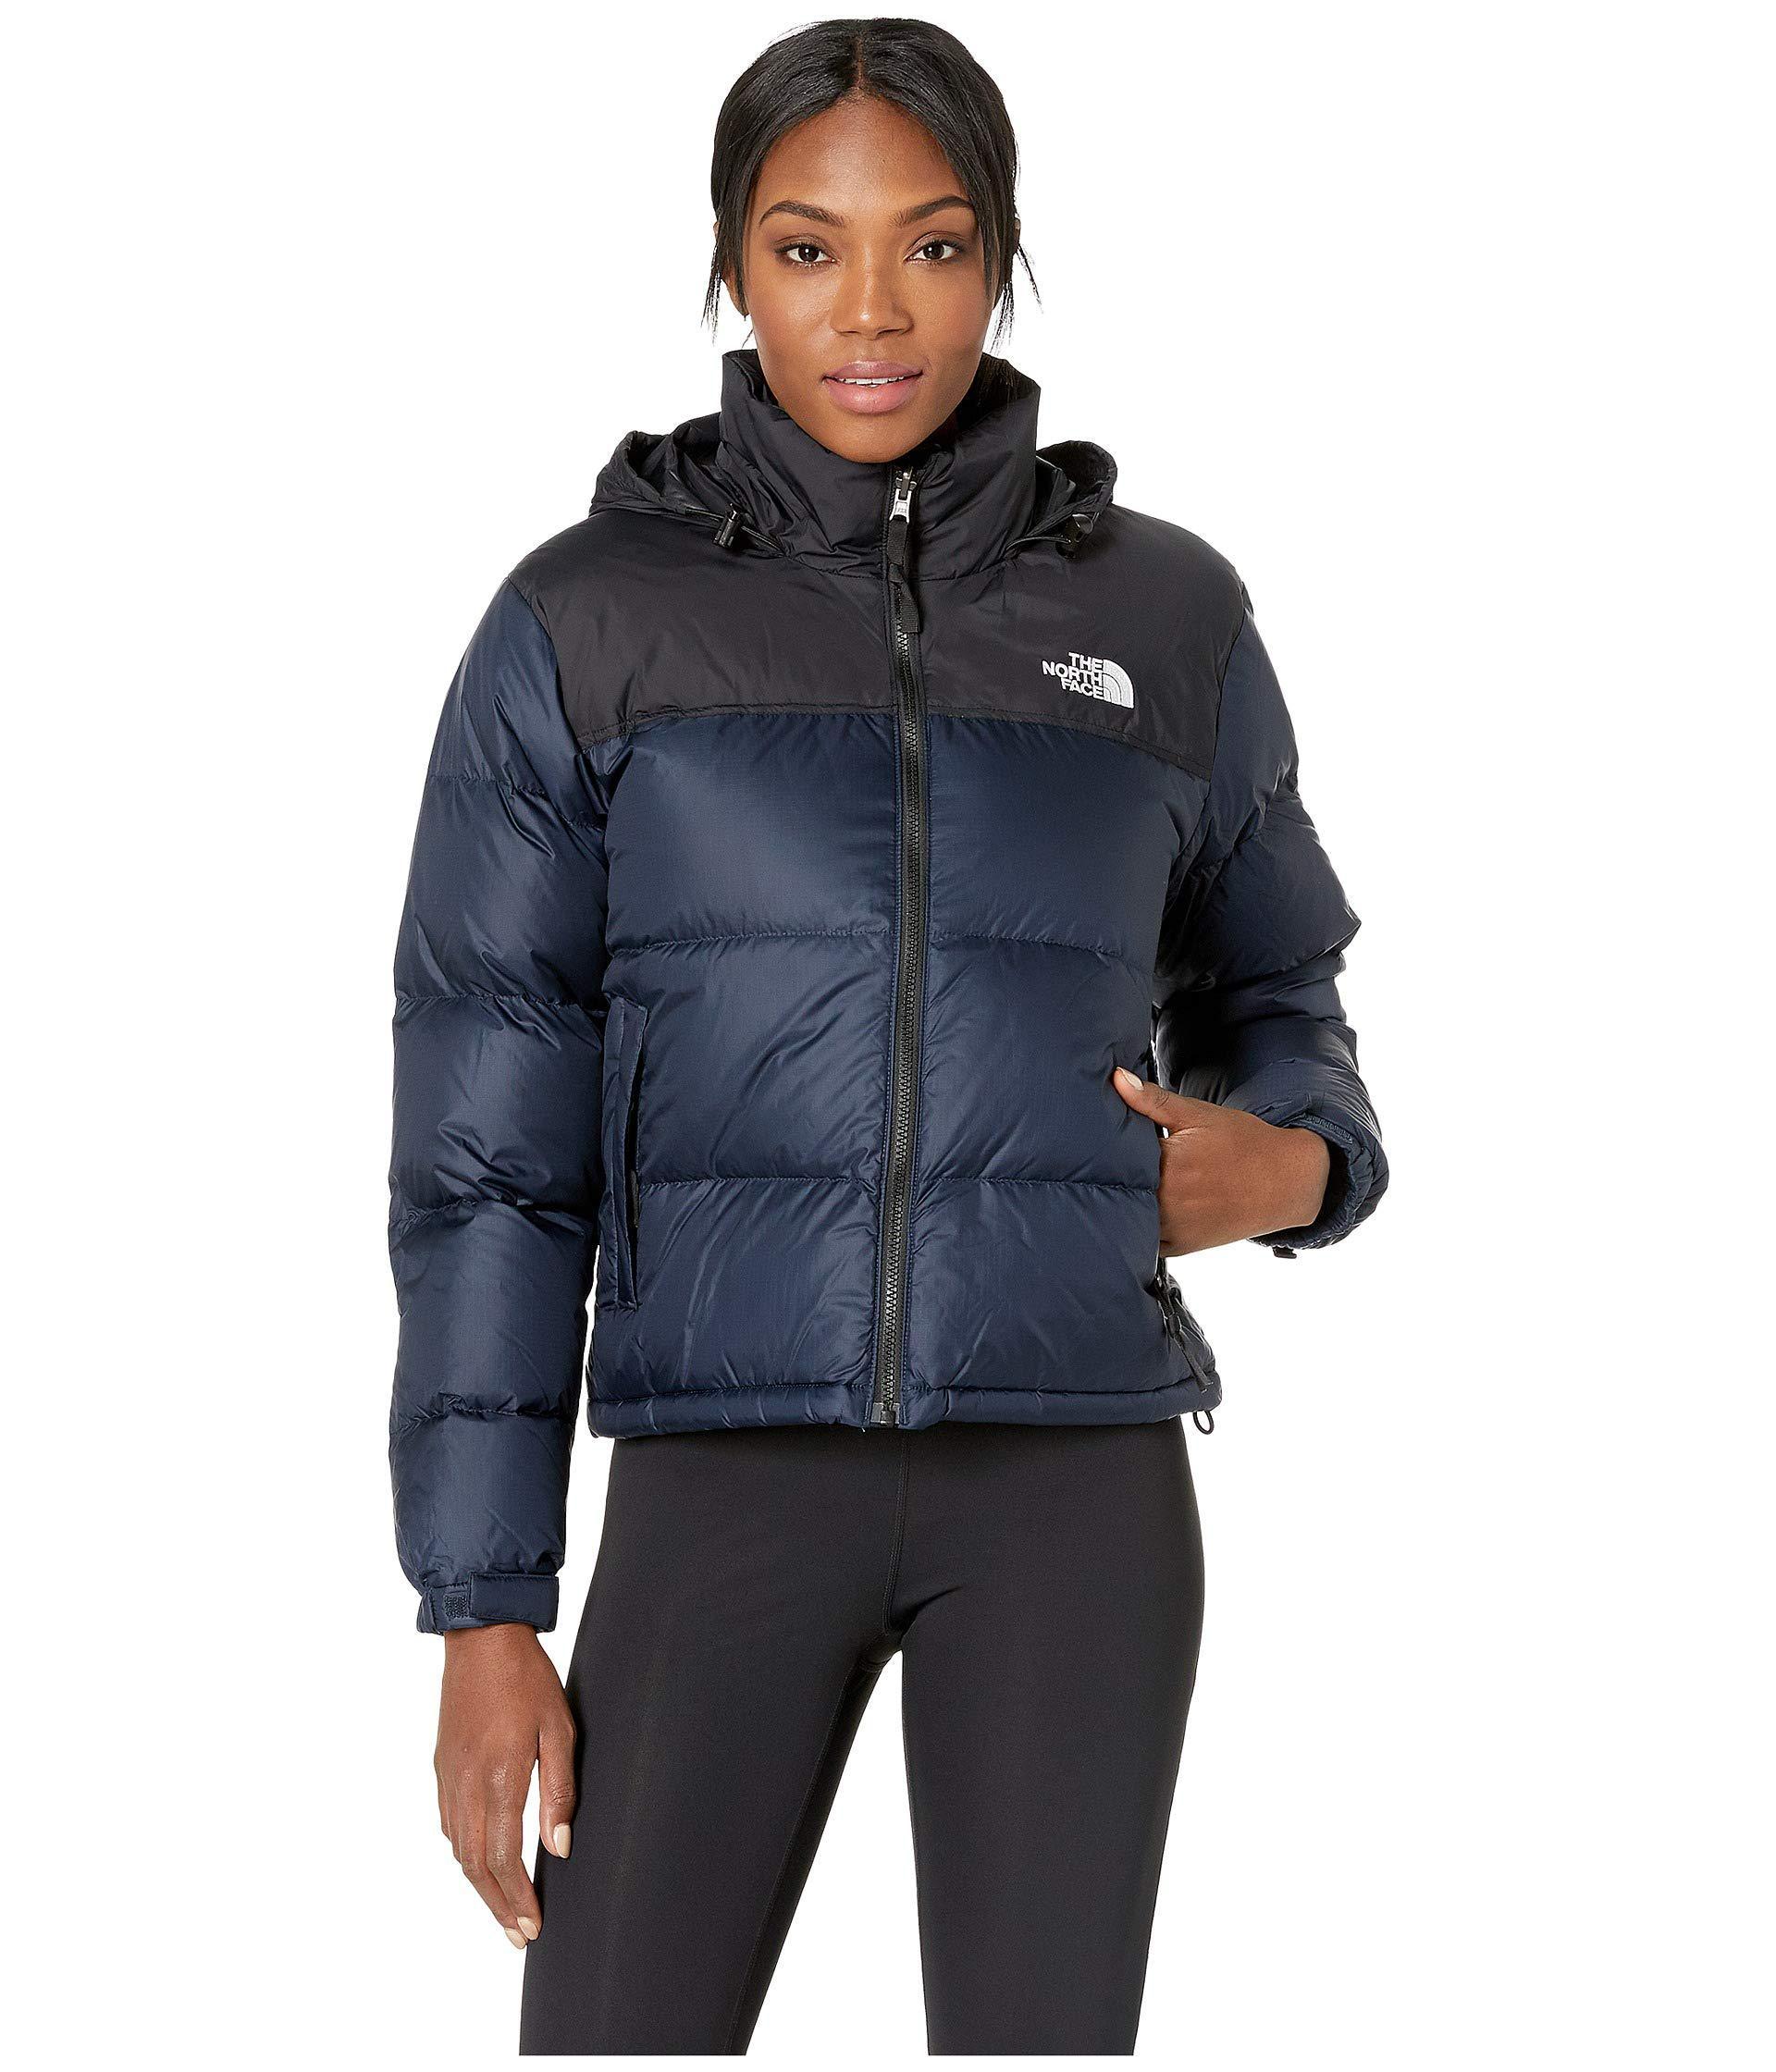 Lyst - The North Face 1996 Retro Nuptse Jacket (tnf Medium Grey ... 9ce24abb7